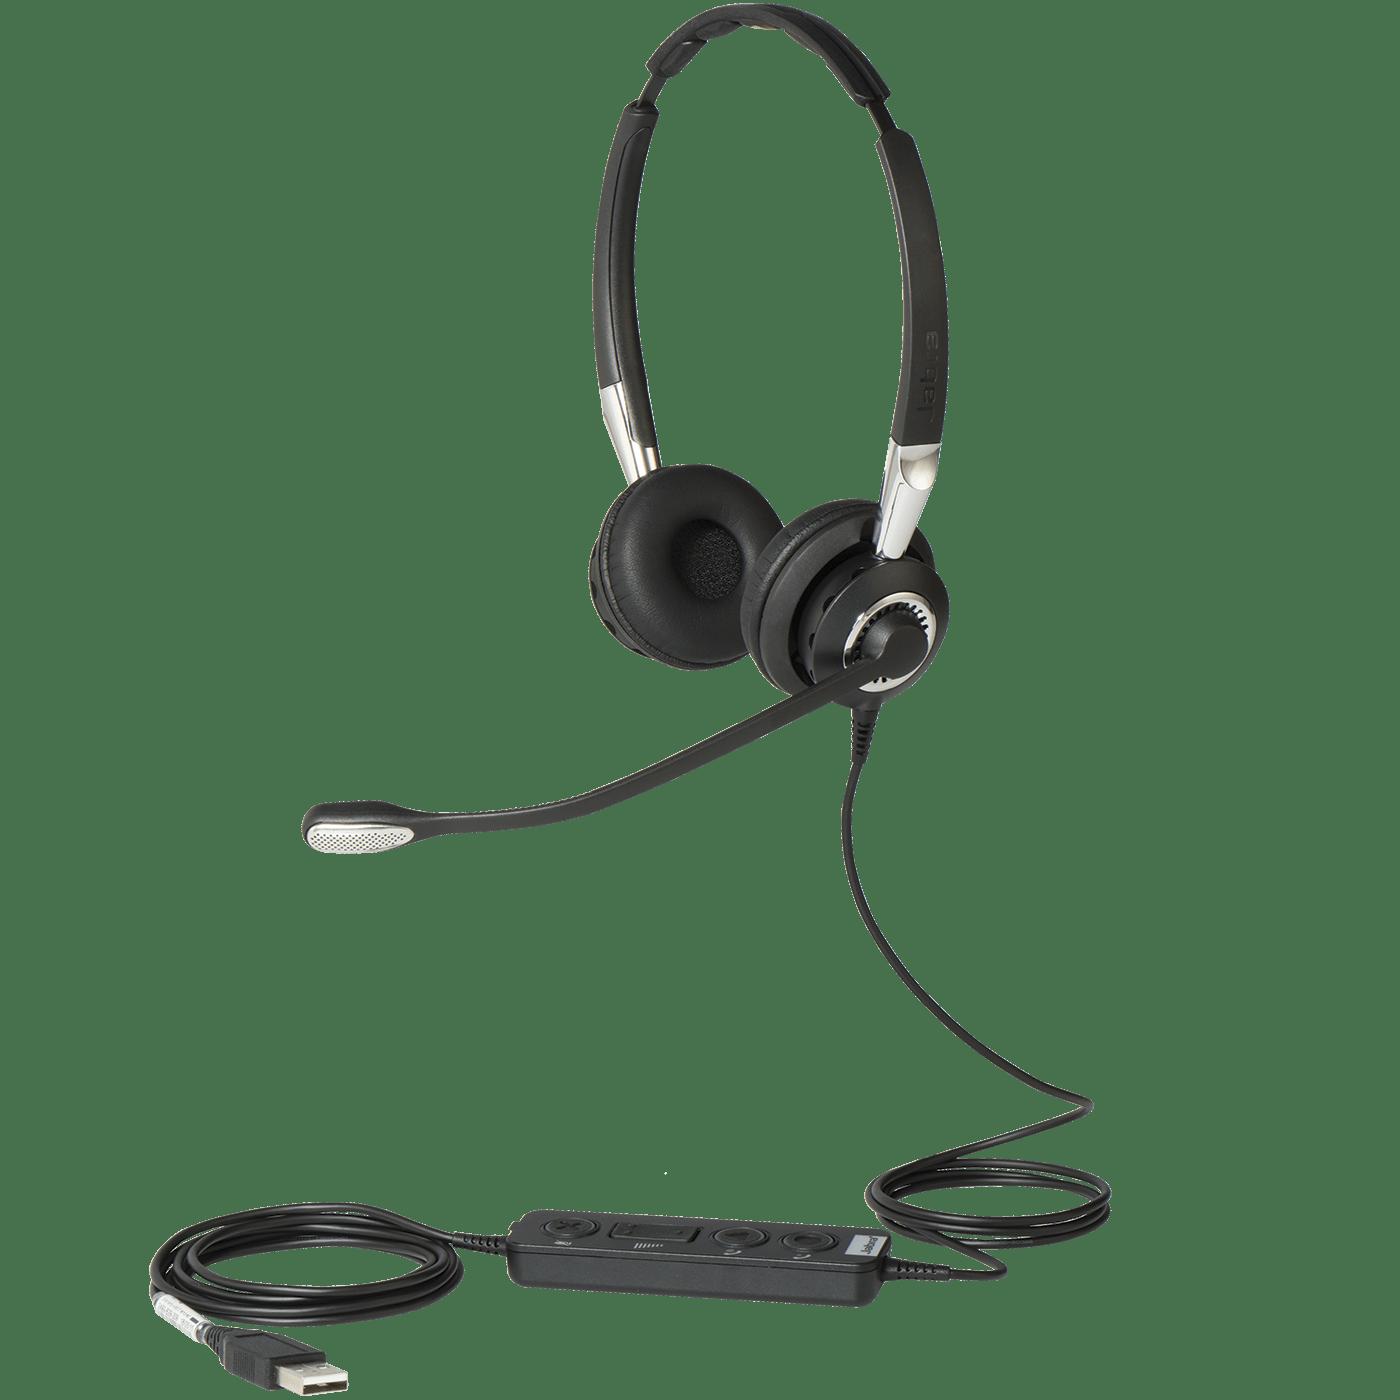 Jabra Biz 2400 II USB Duo CC 0001 2499 829 209 Image eCom